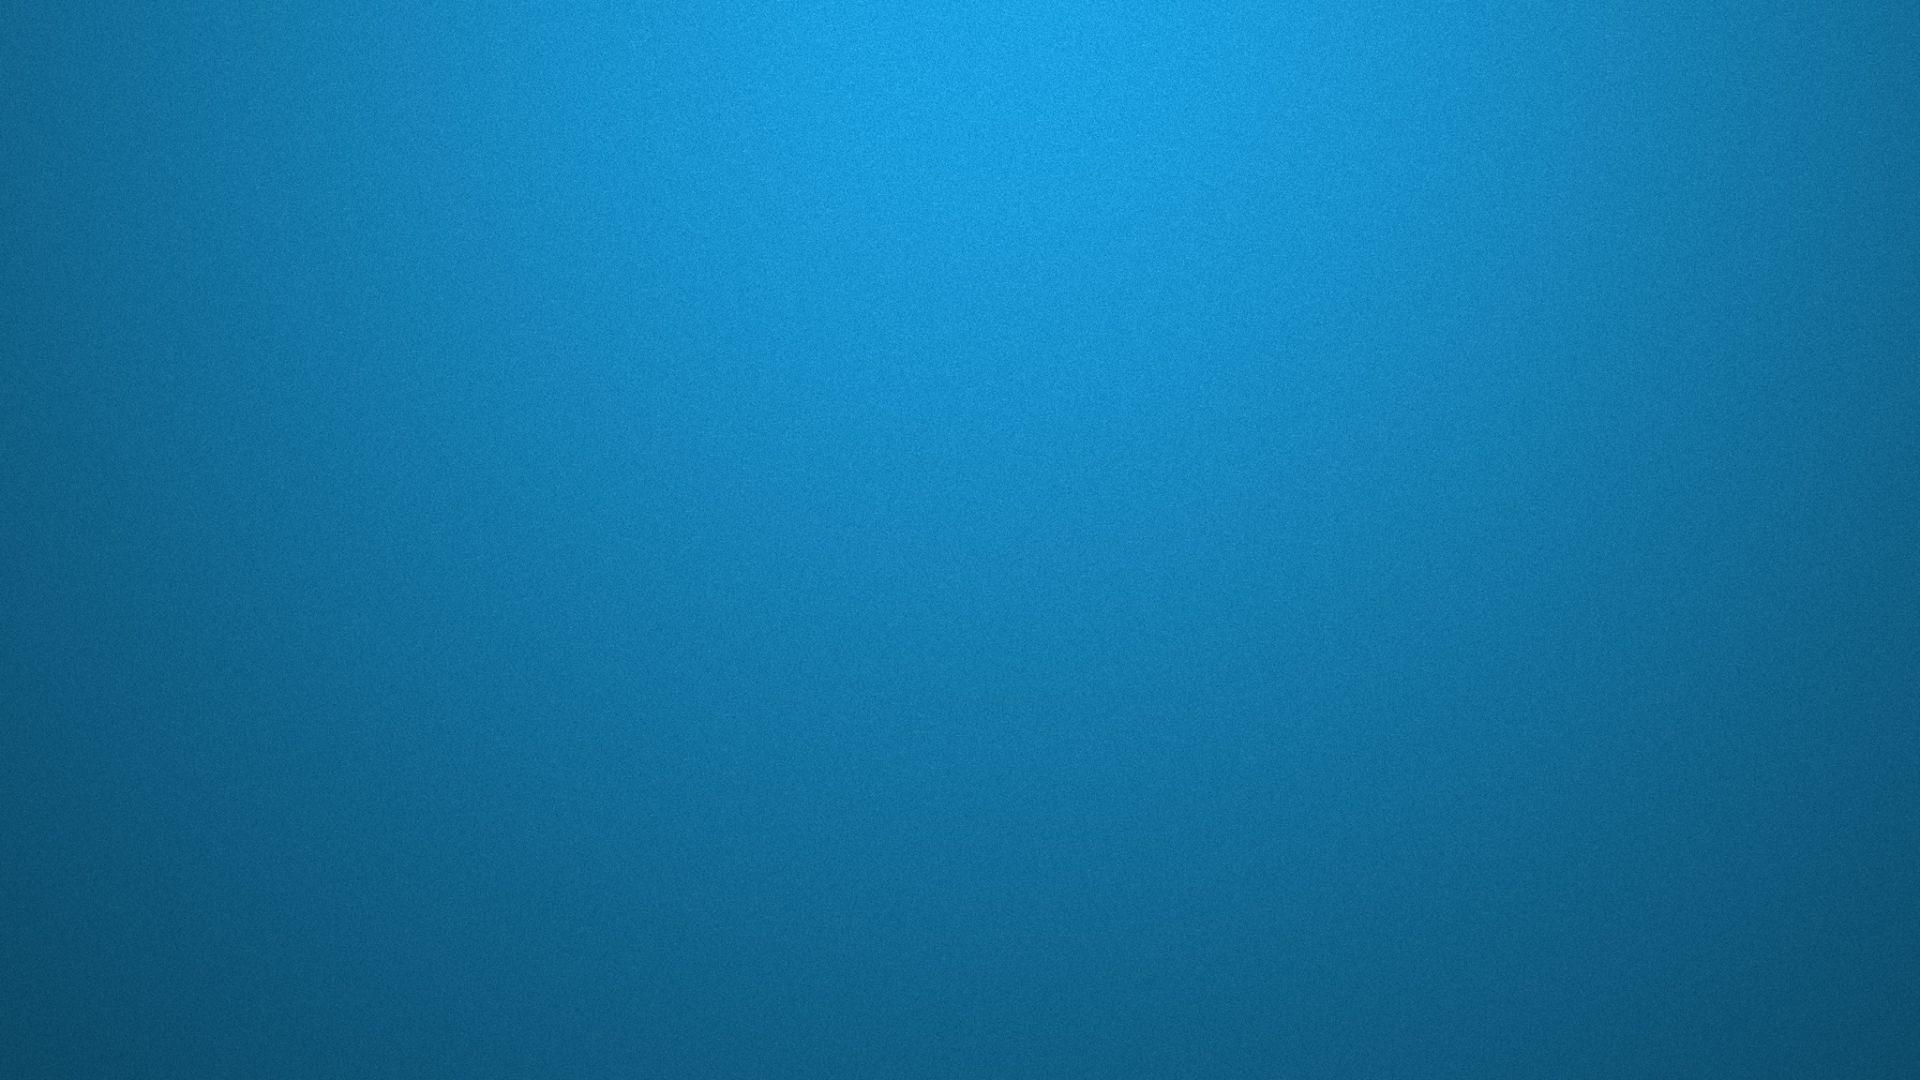 Cute Blue computer Wallpaper